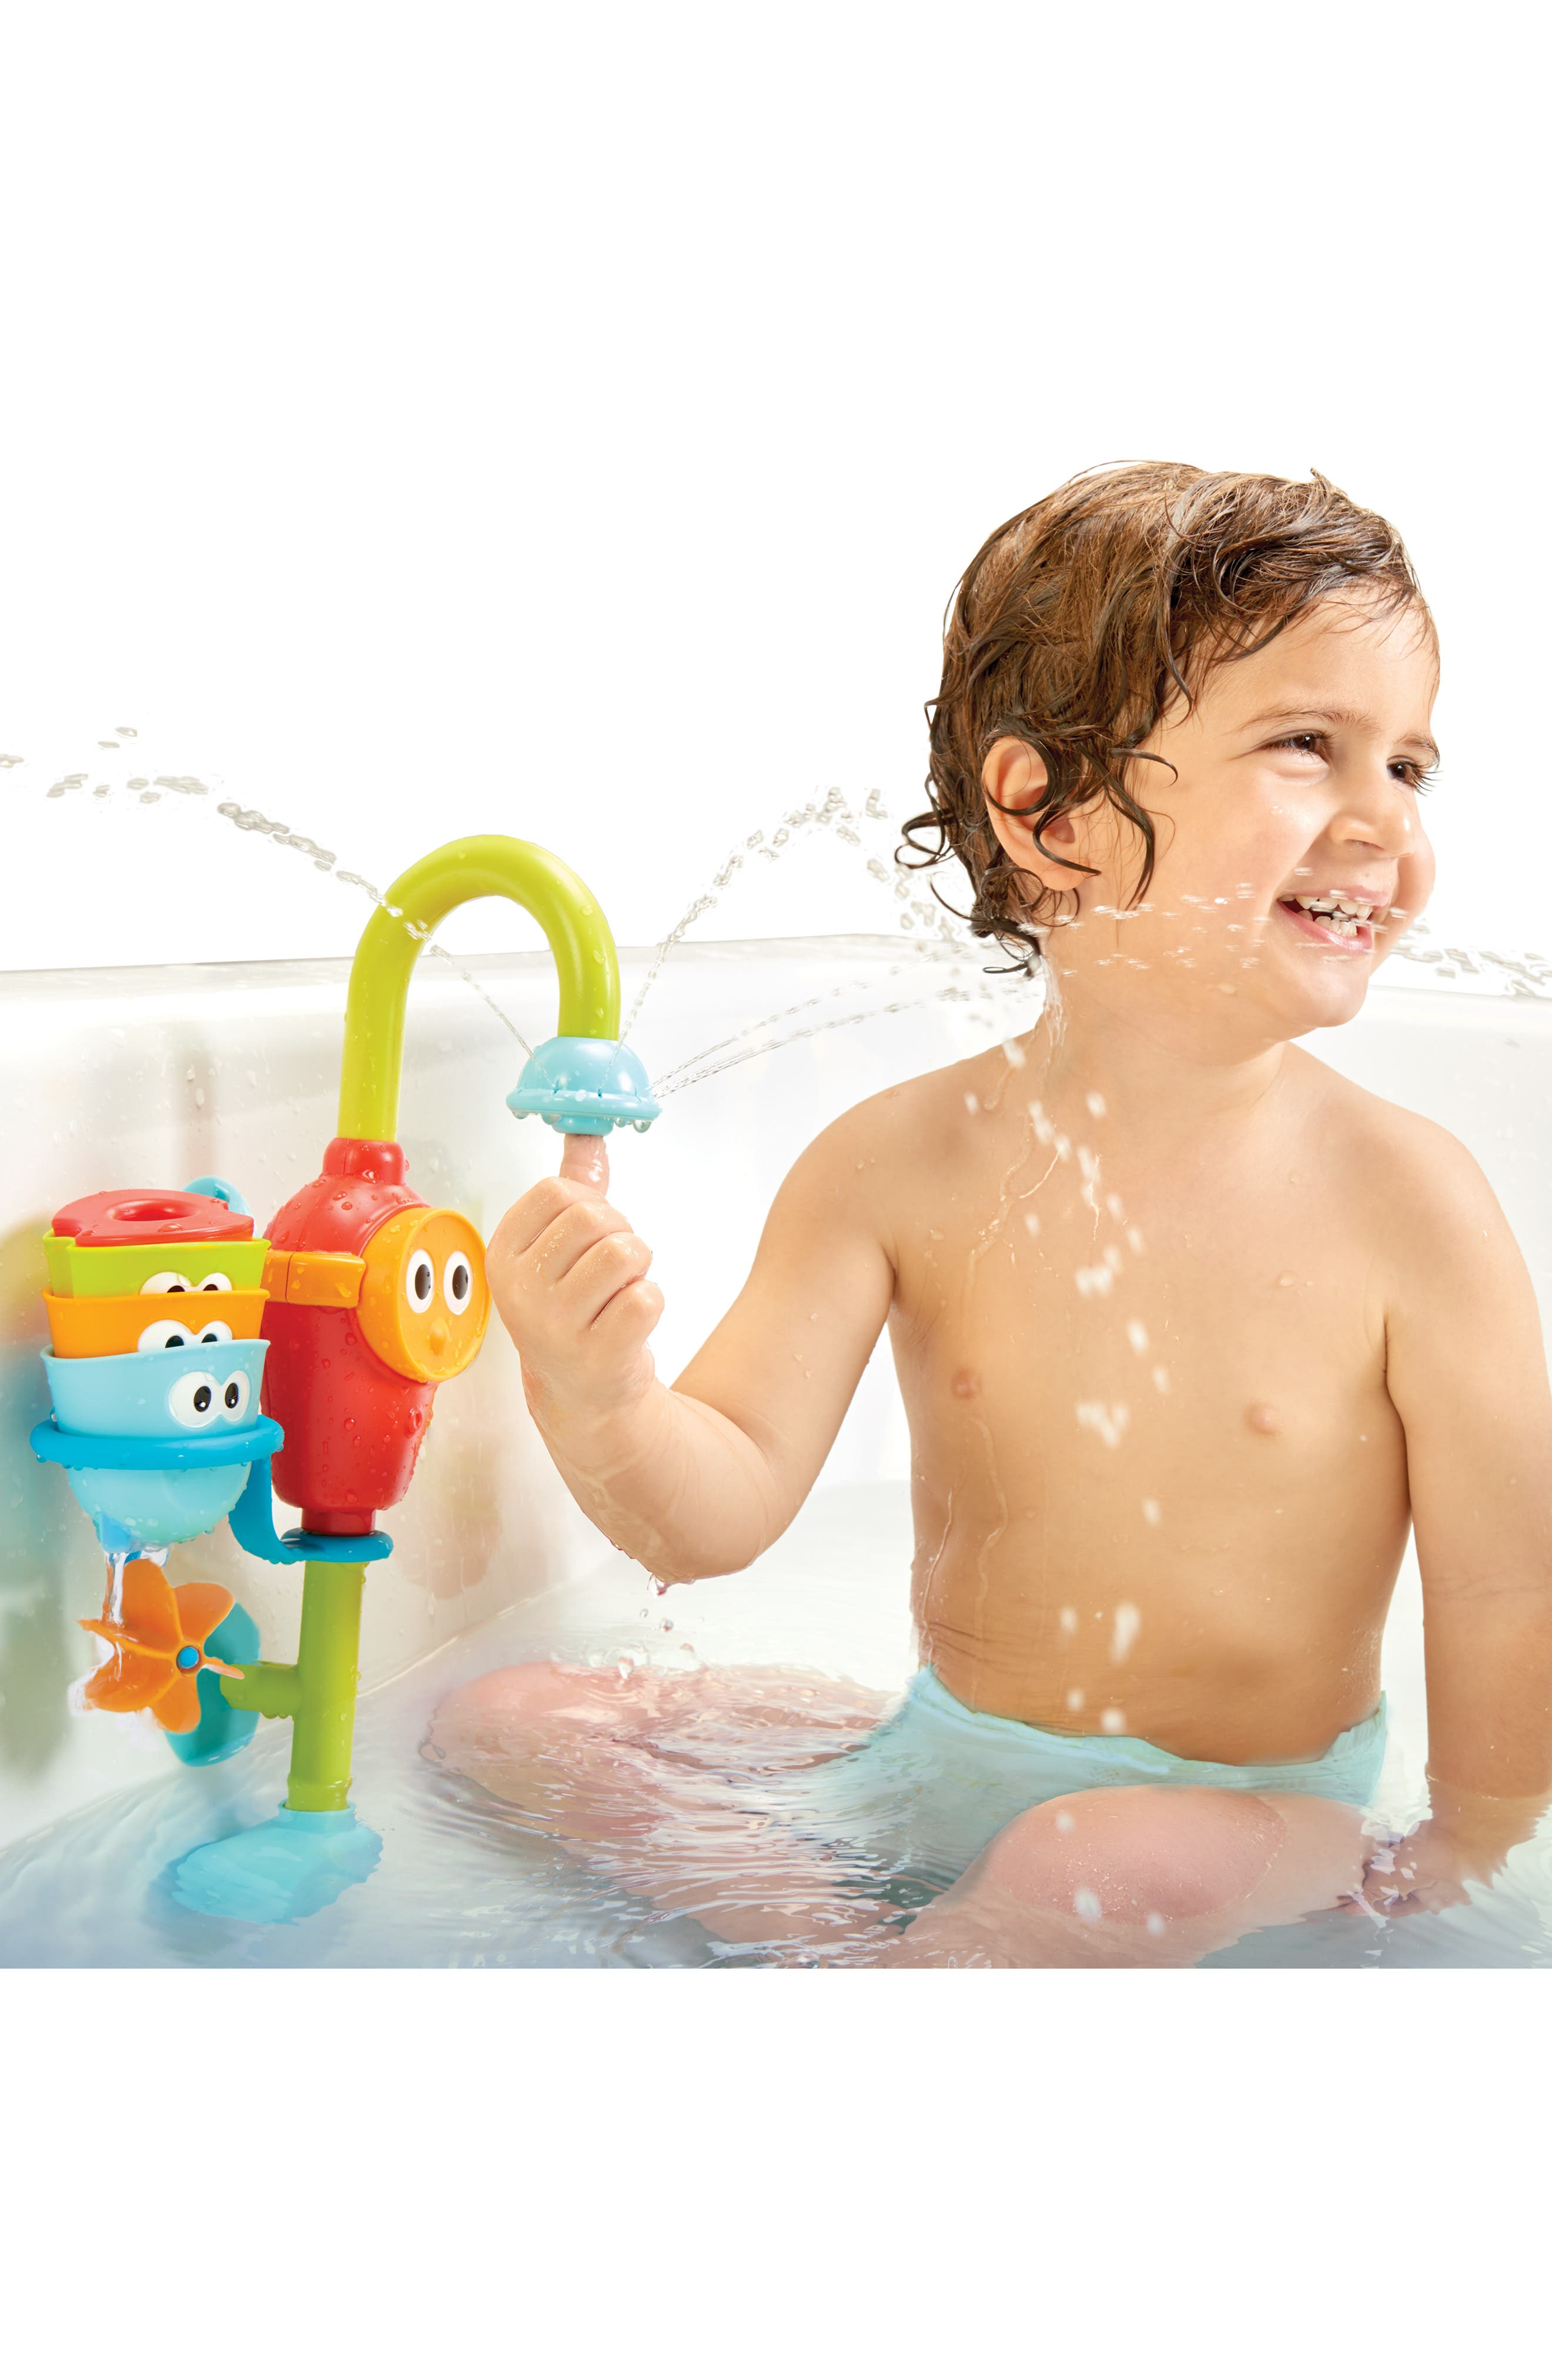 Flow 'N' Fill Spout Bath Toy,                             Alternate thumbnail 5, color,                             GREEN